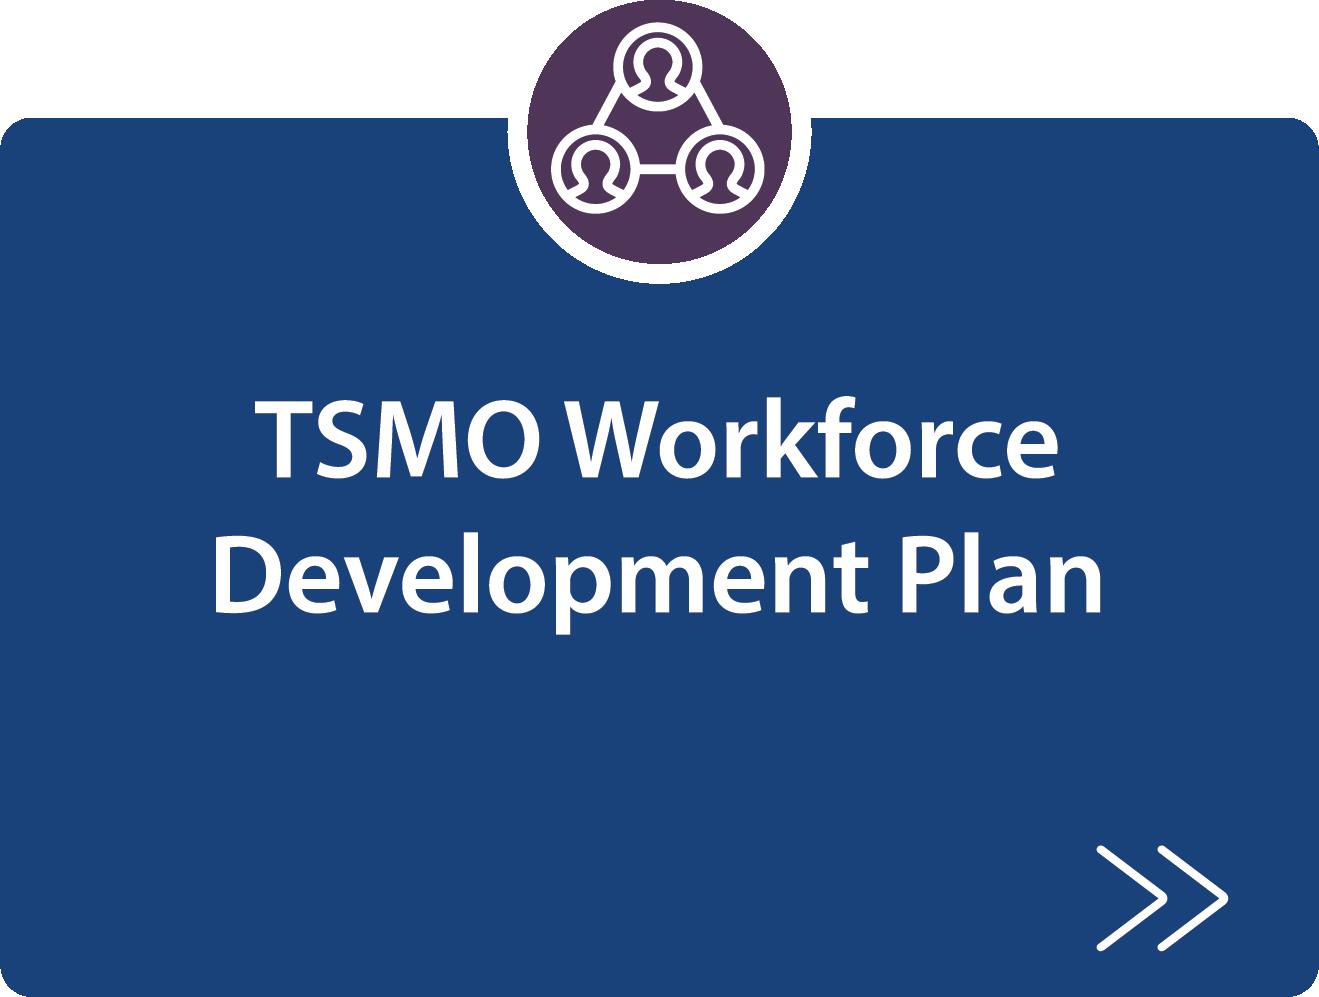 TSMO Workforce Development Plan description